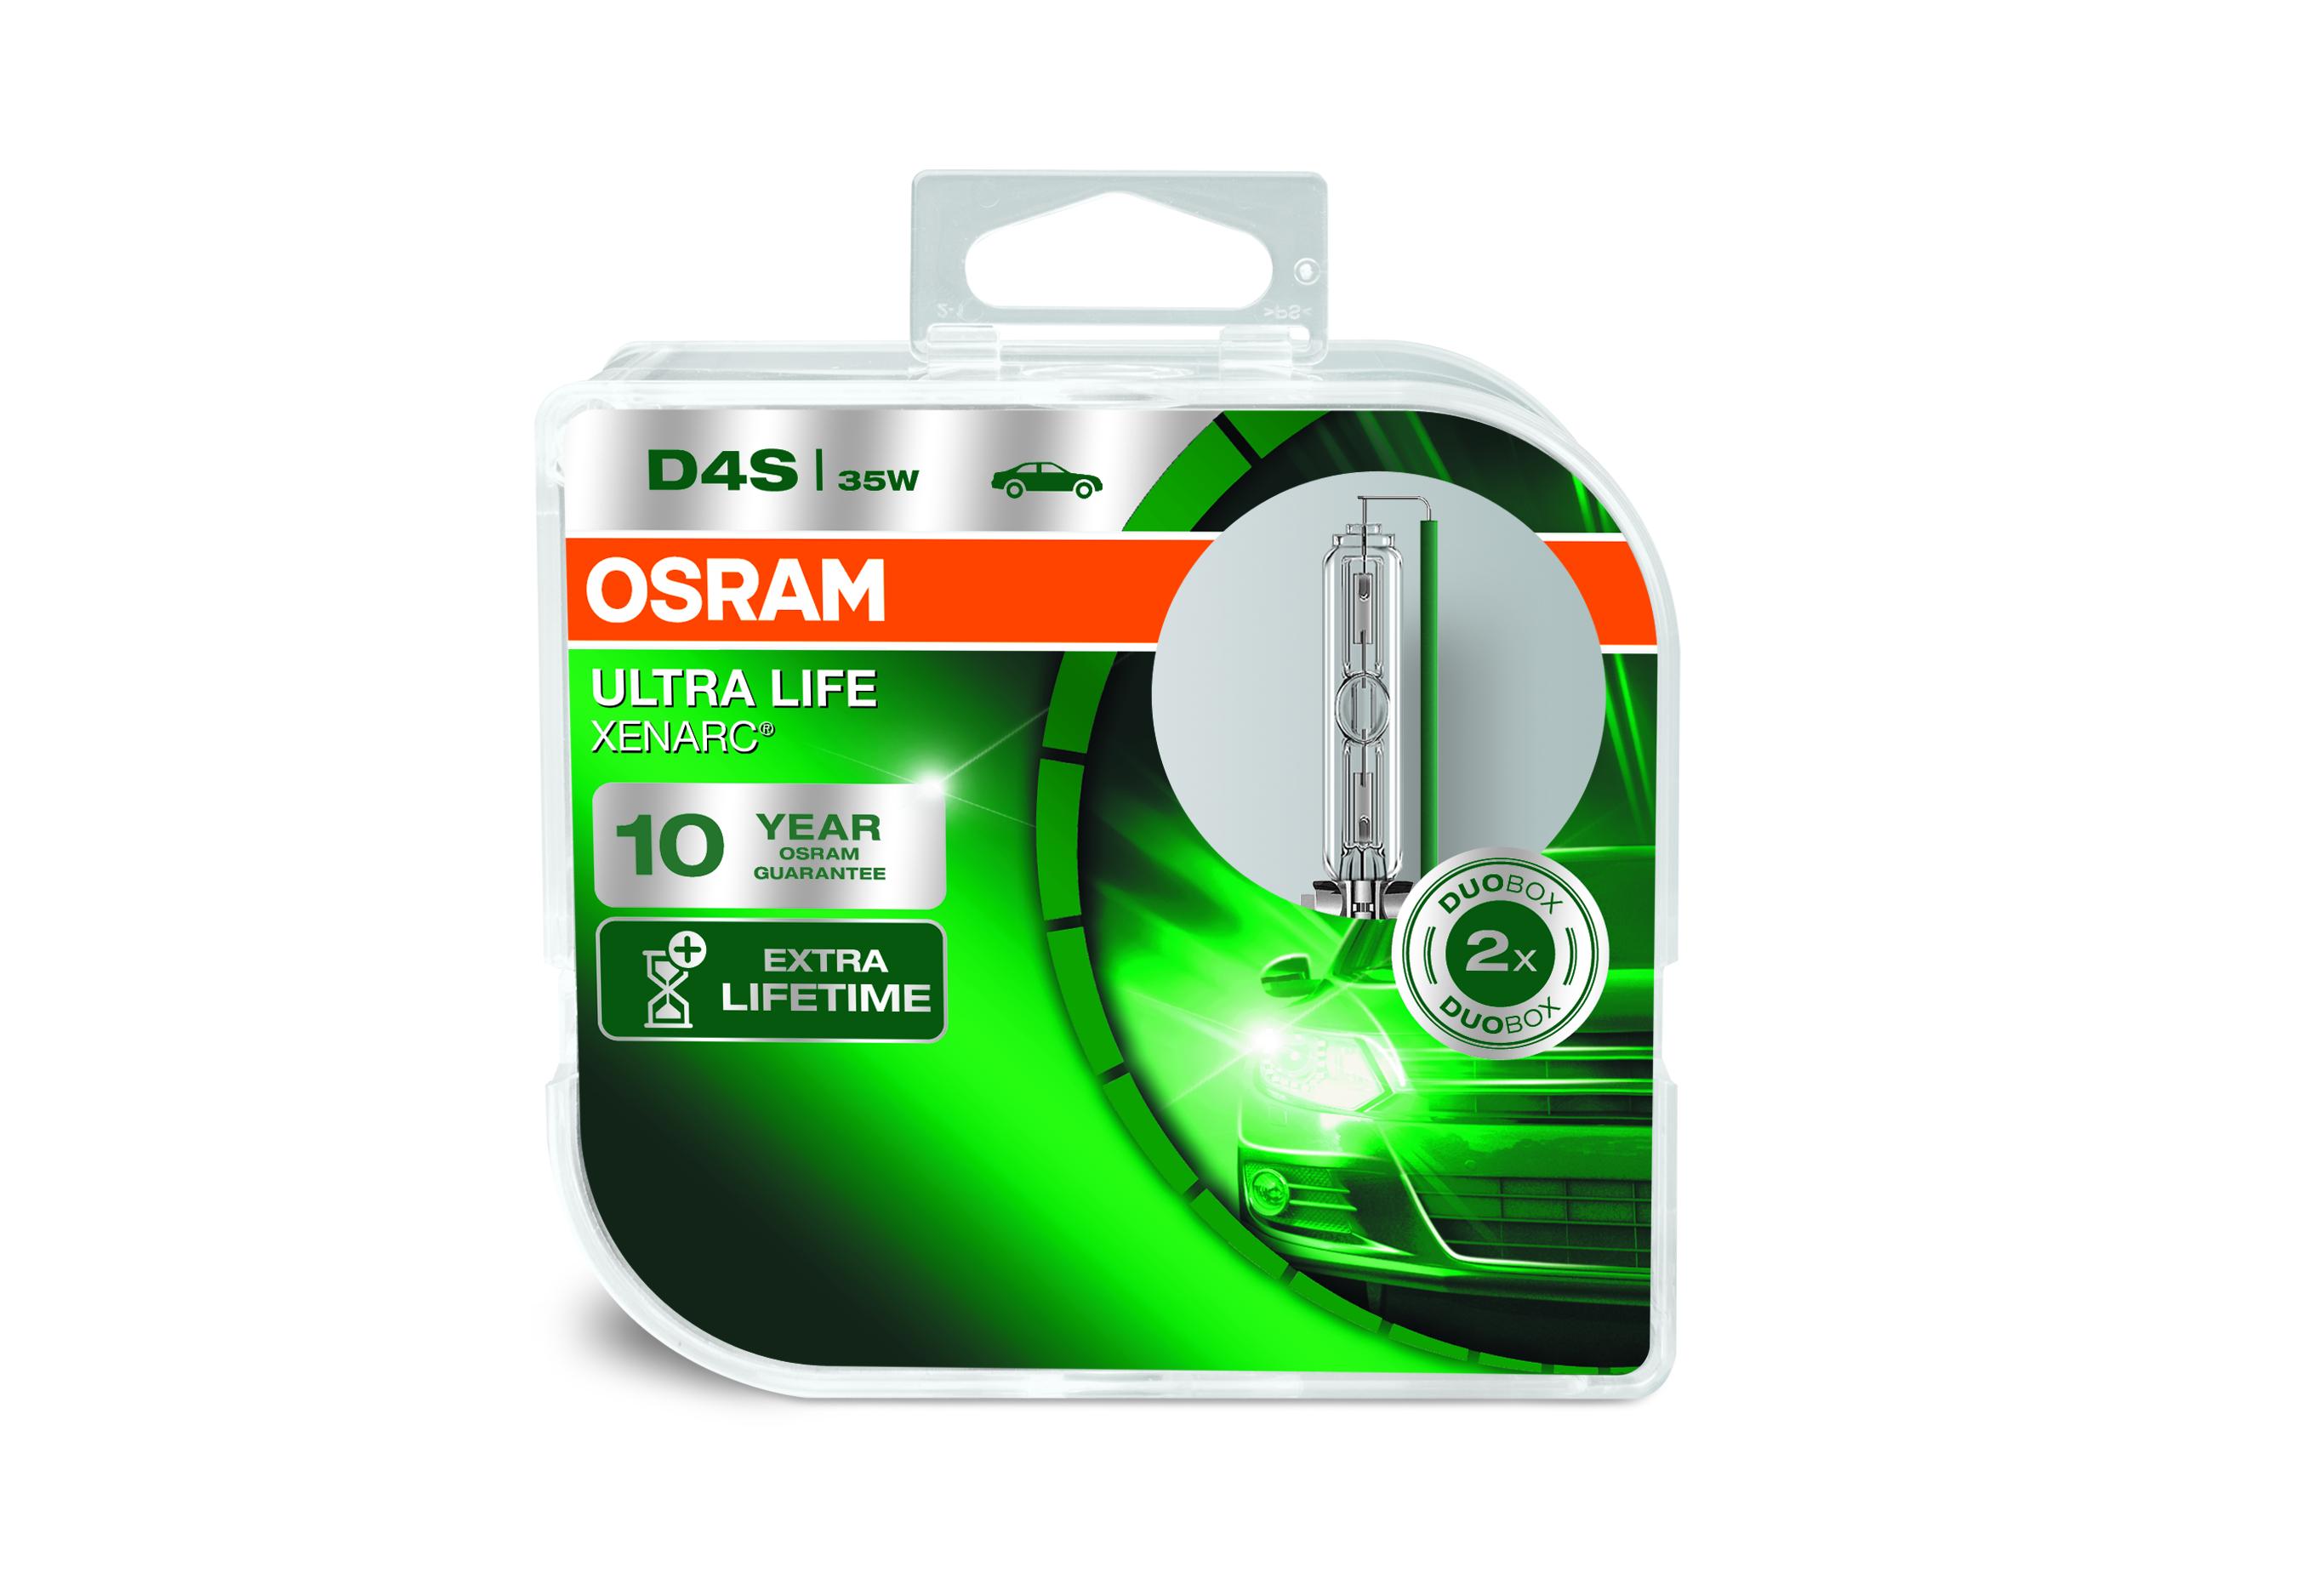 Osram Xenonová výbojka, XENARC ULTRALIFE, D4S, P32d-5, 12/24V, 35W, 66440ULT-HCB